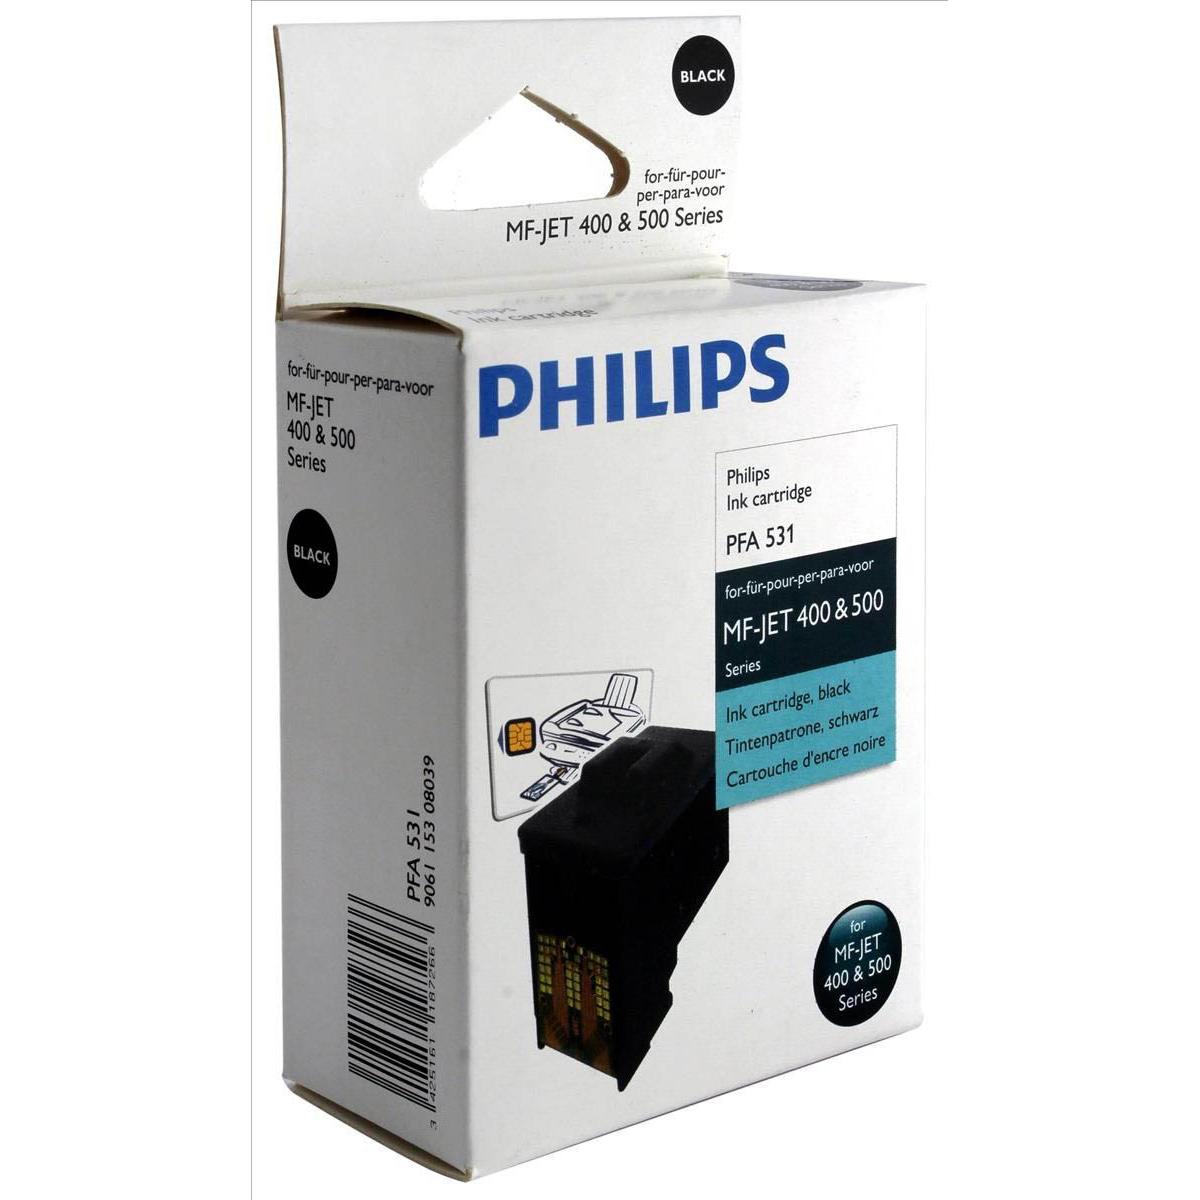 Original Philips PFA531 Black Ink Cartridge (PFA531)